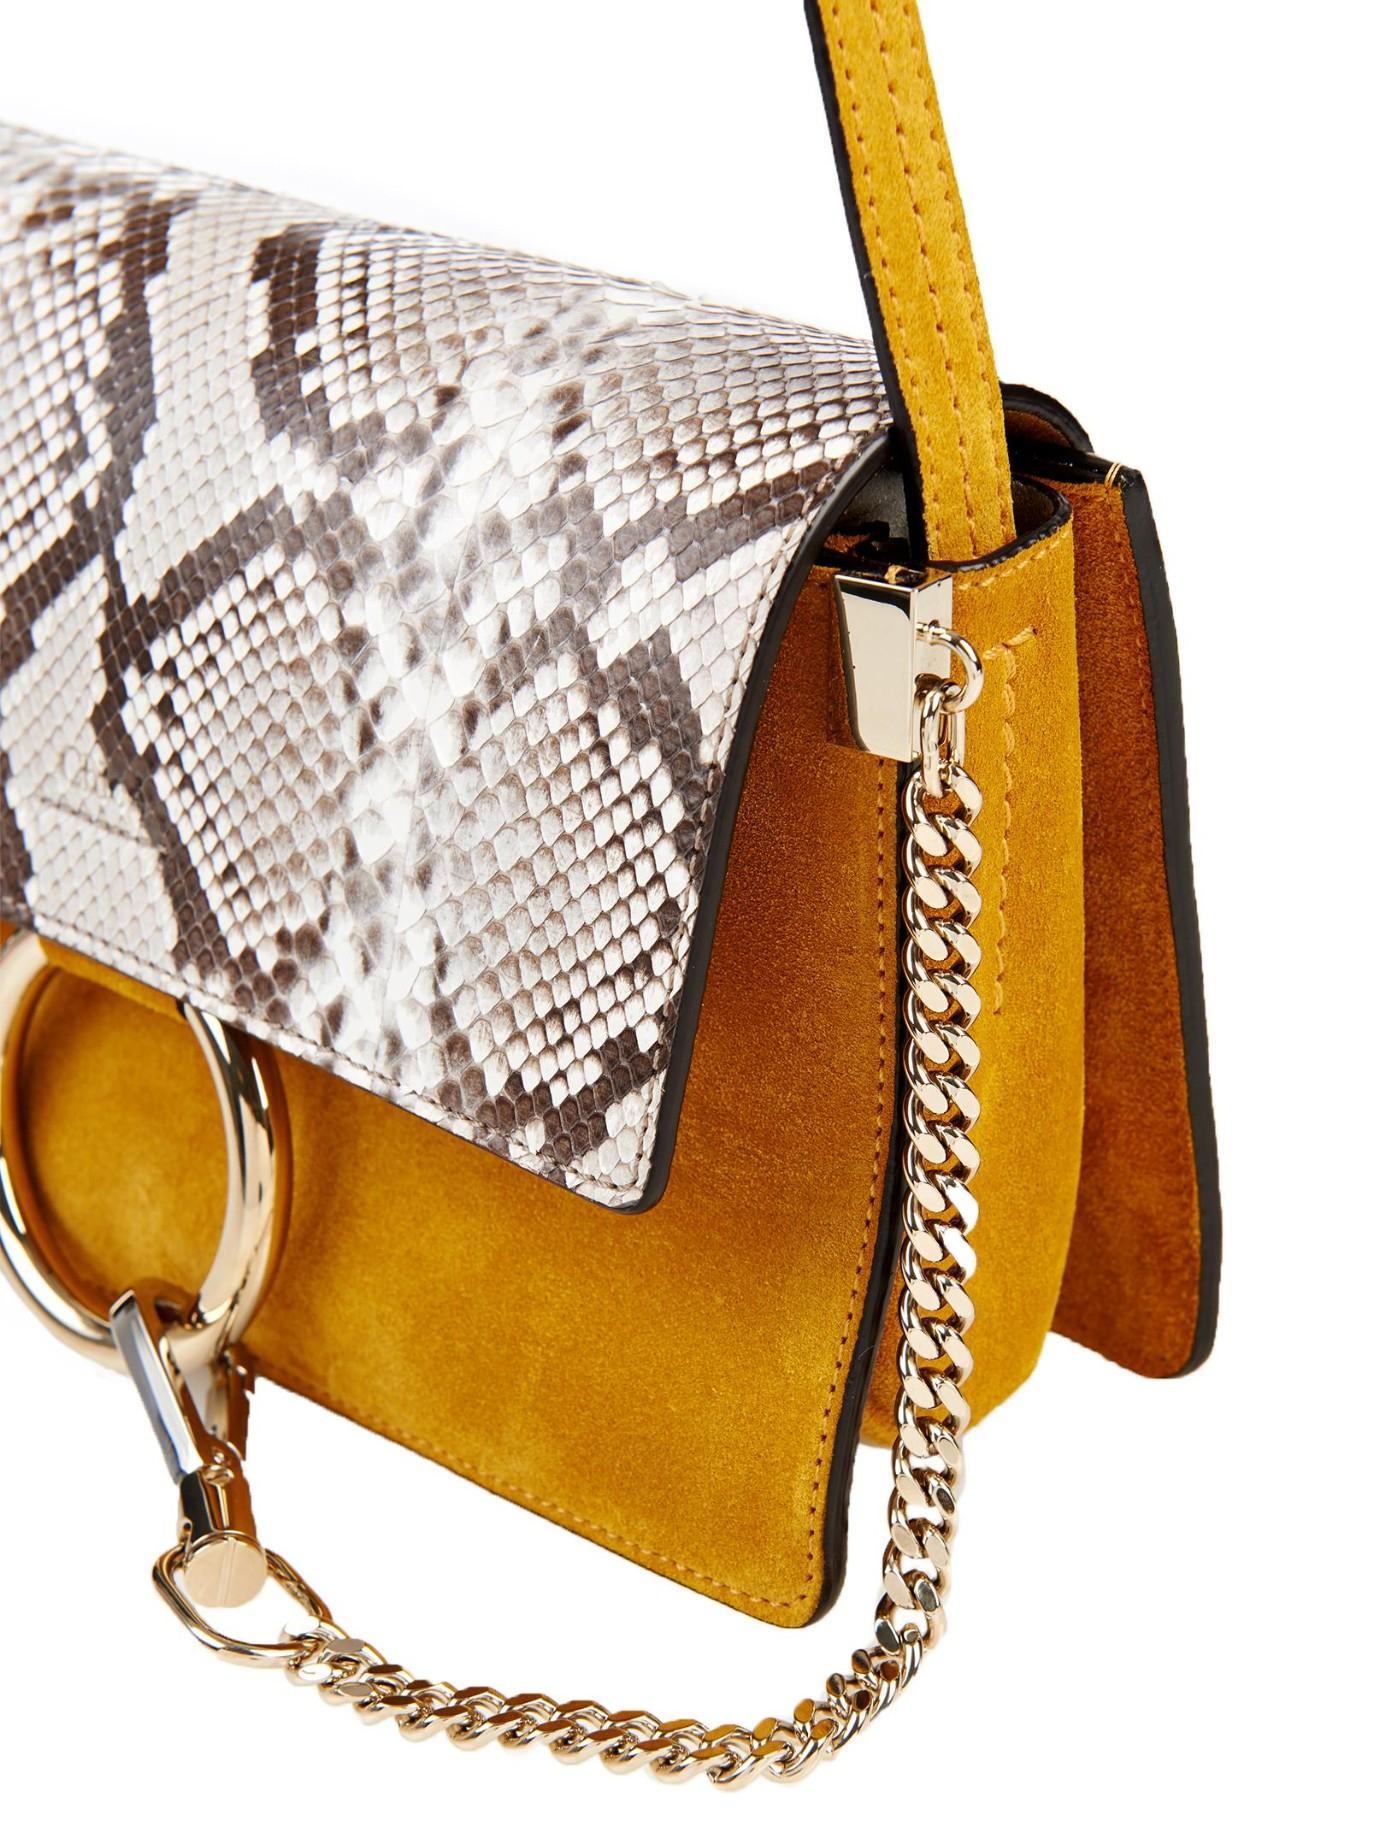 a3192f3613428 replica chloe purse - Chlo¨¦ Faye Small Python and Suede Cross-Body Bag